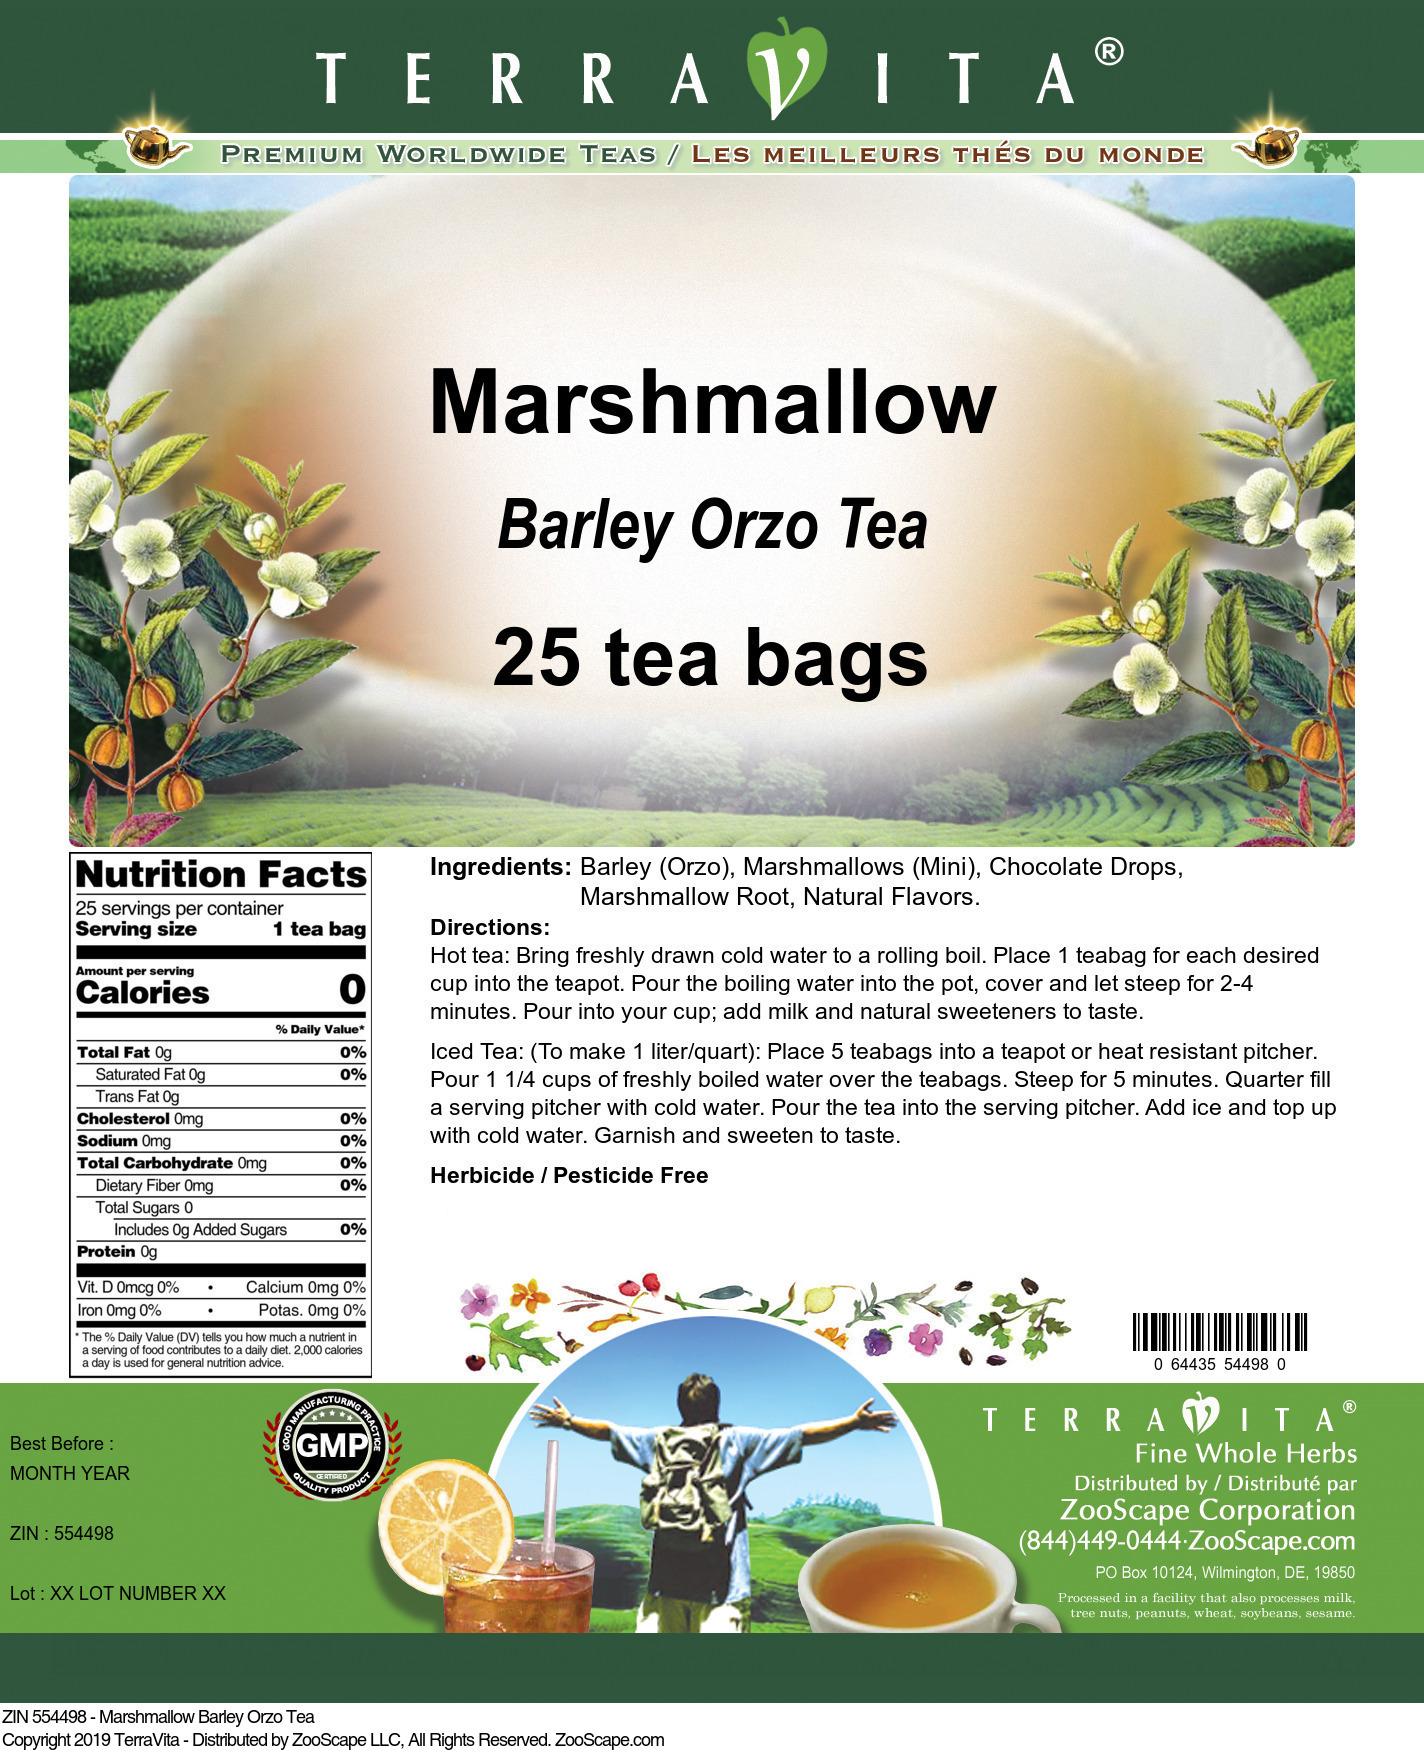 Marshmallow Barley Orzo